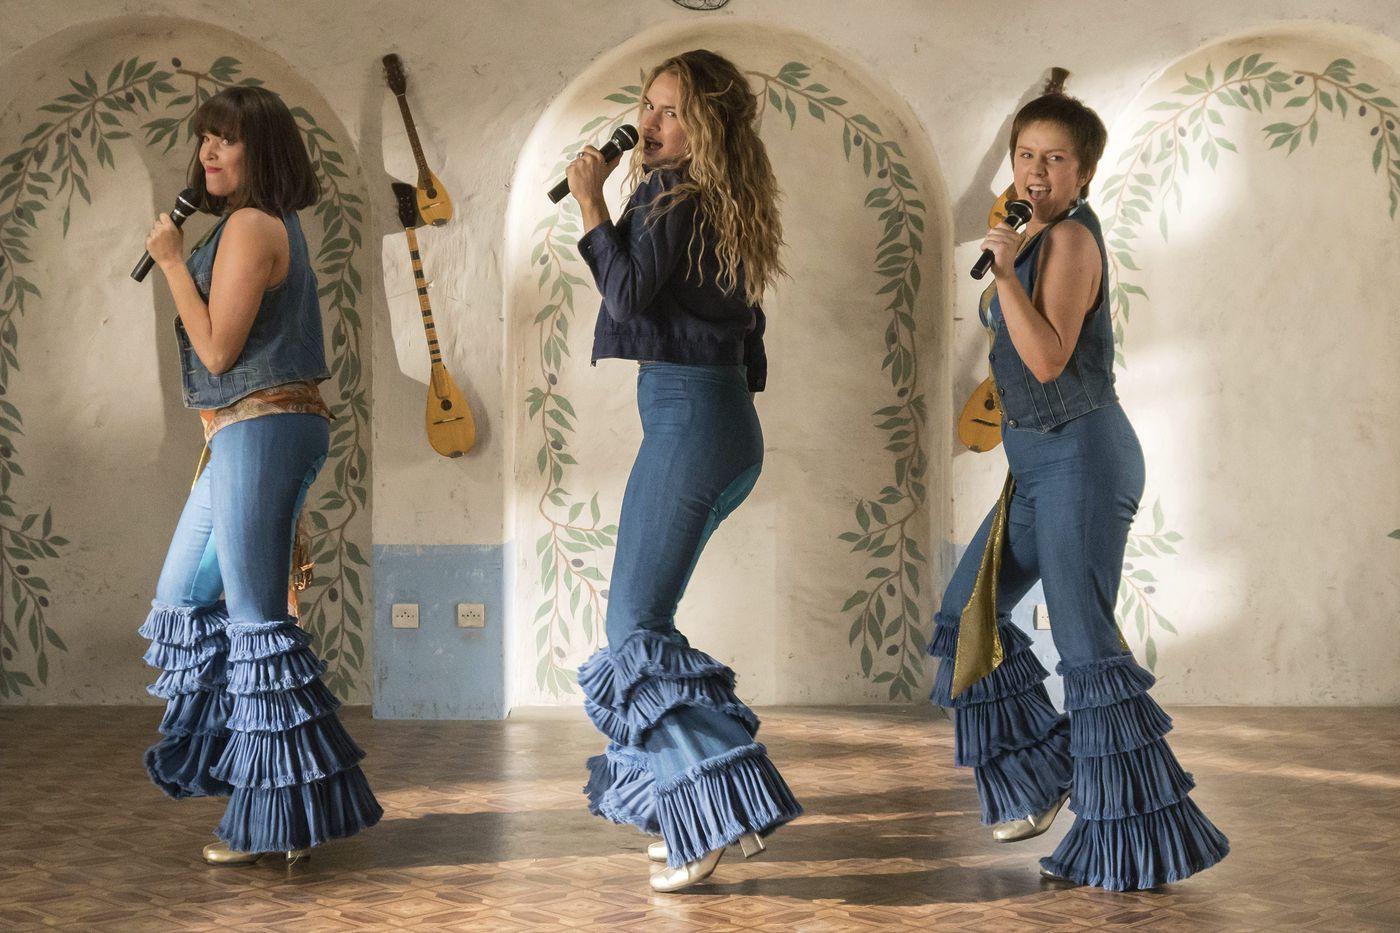 ABBA-cadabra: A little magic left in 'Mamma Mia, Here We Go Again'